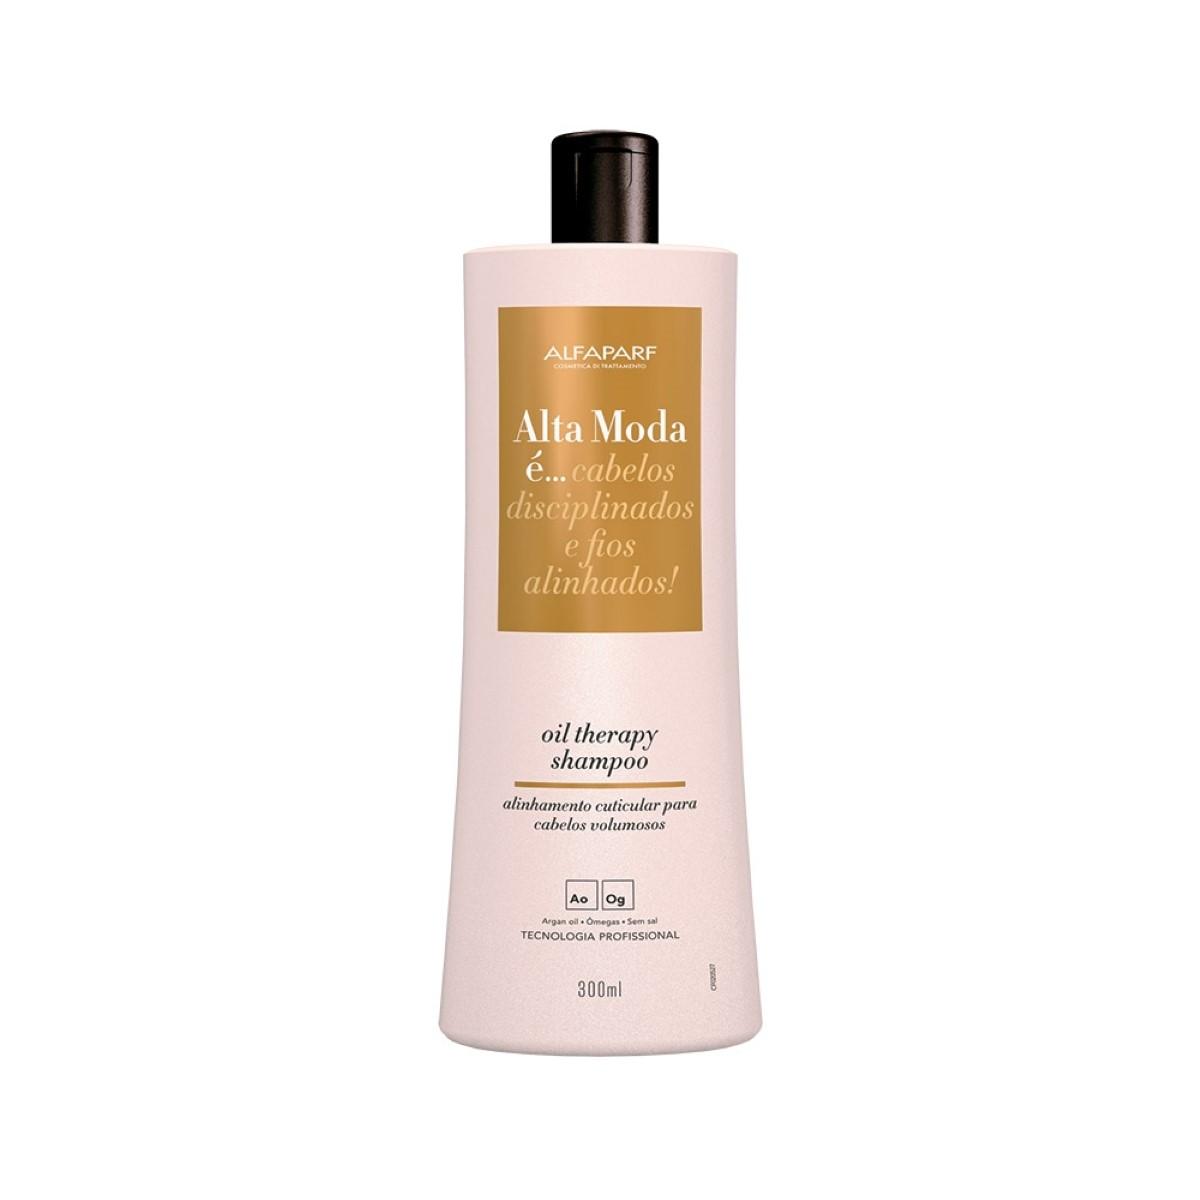 Shampoo Oil Therapy Alta Moda 300ml - Alfaparf